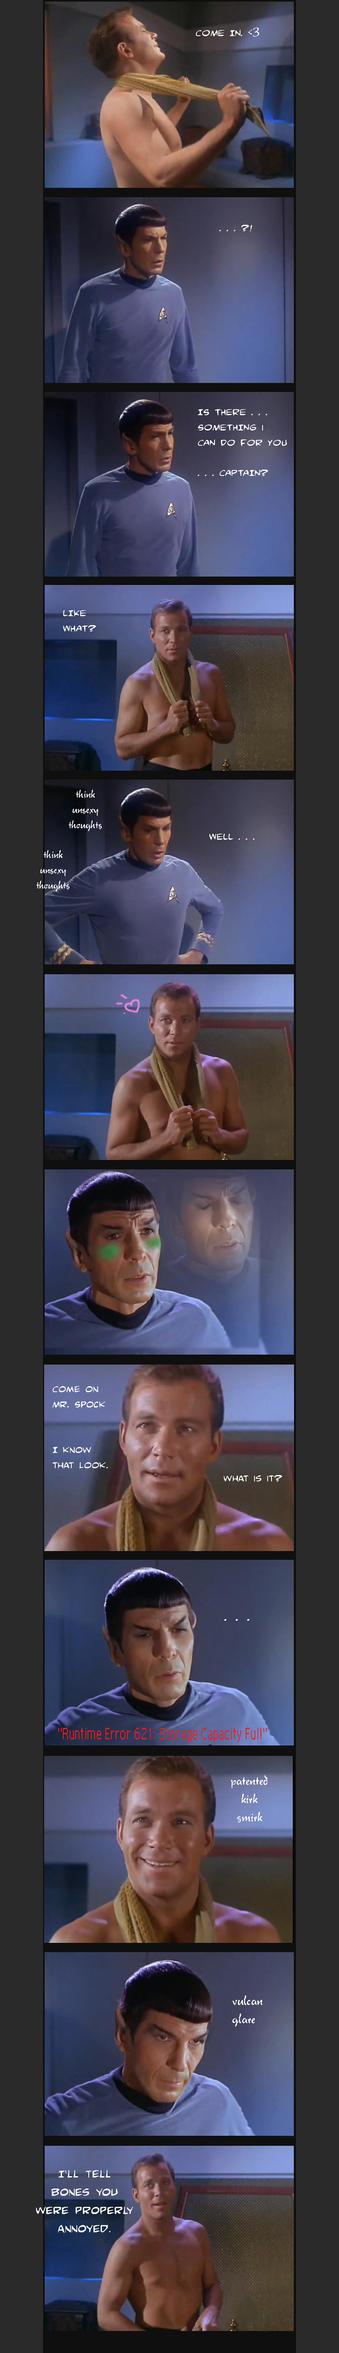 Spock's System Error by MonacoMac